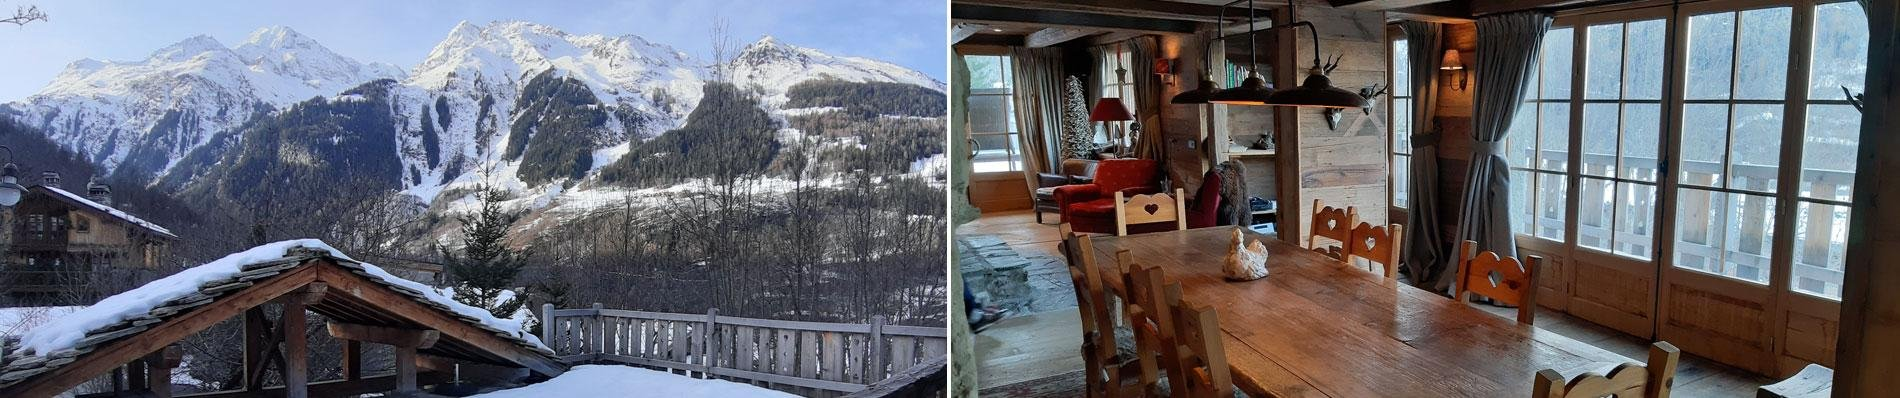 sainte foy chalet le baptieu ski frankrijk wintersport